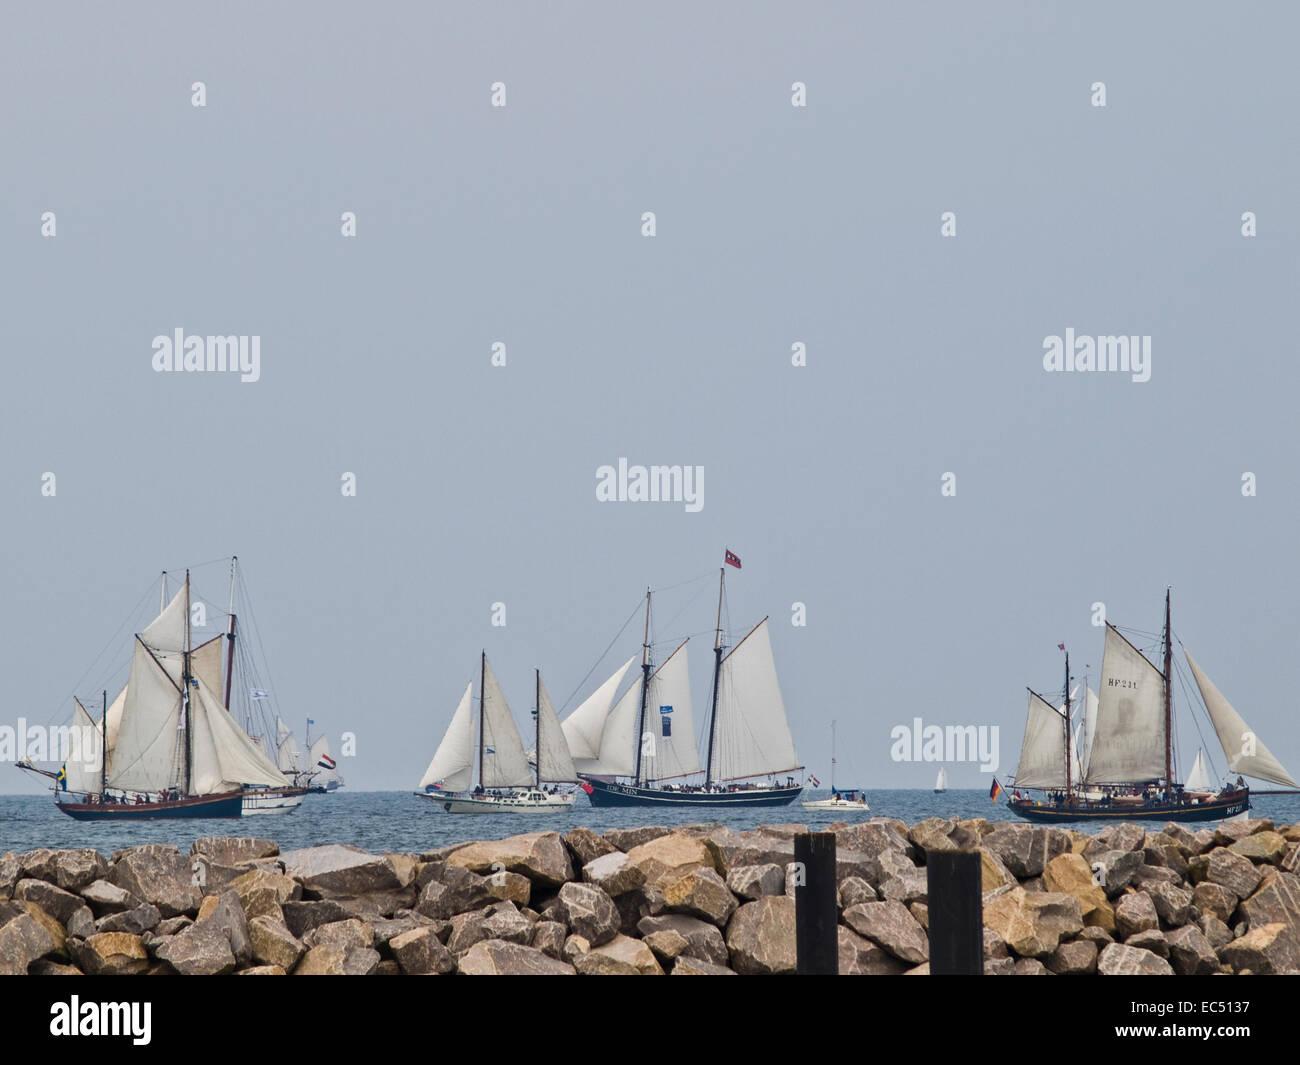 quot Haikutter quot Fishing Smack Regatta outside Warnemünde, Mecklenburg West Pomerania, Germany - Stock Image